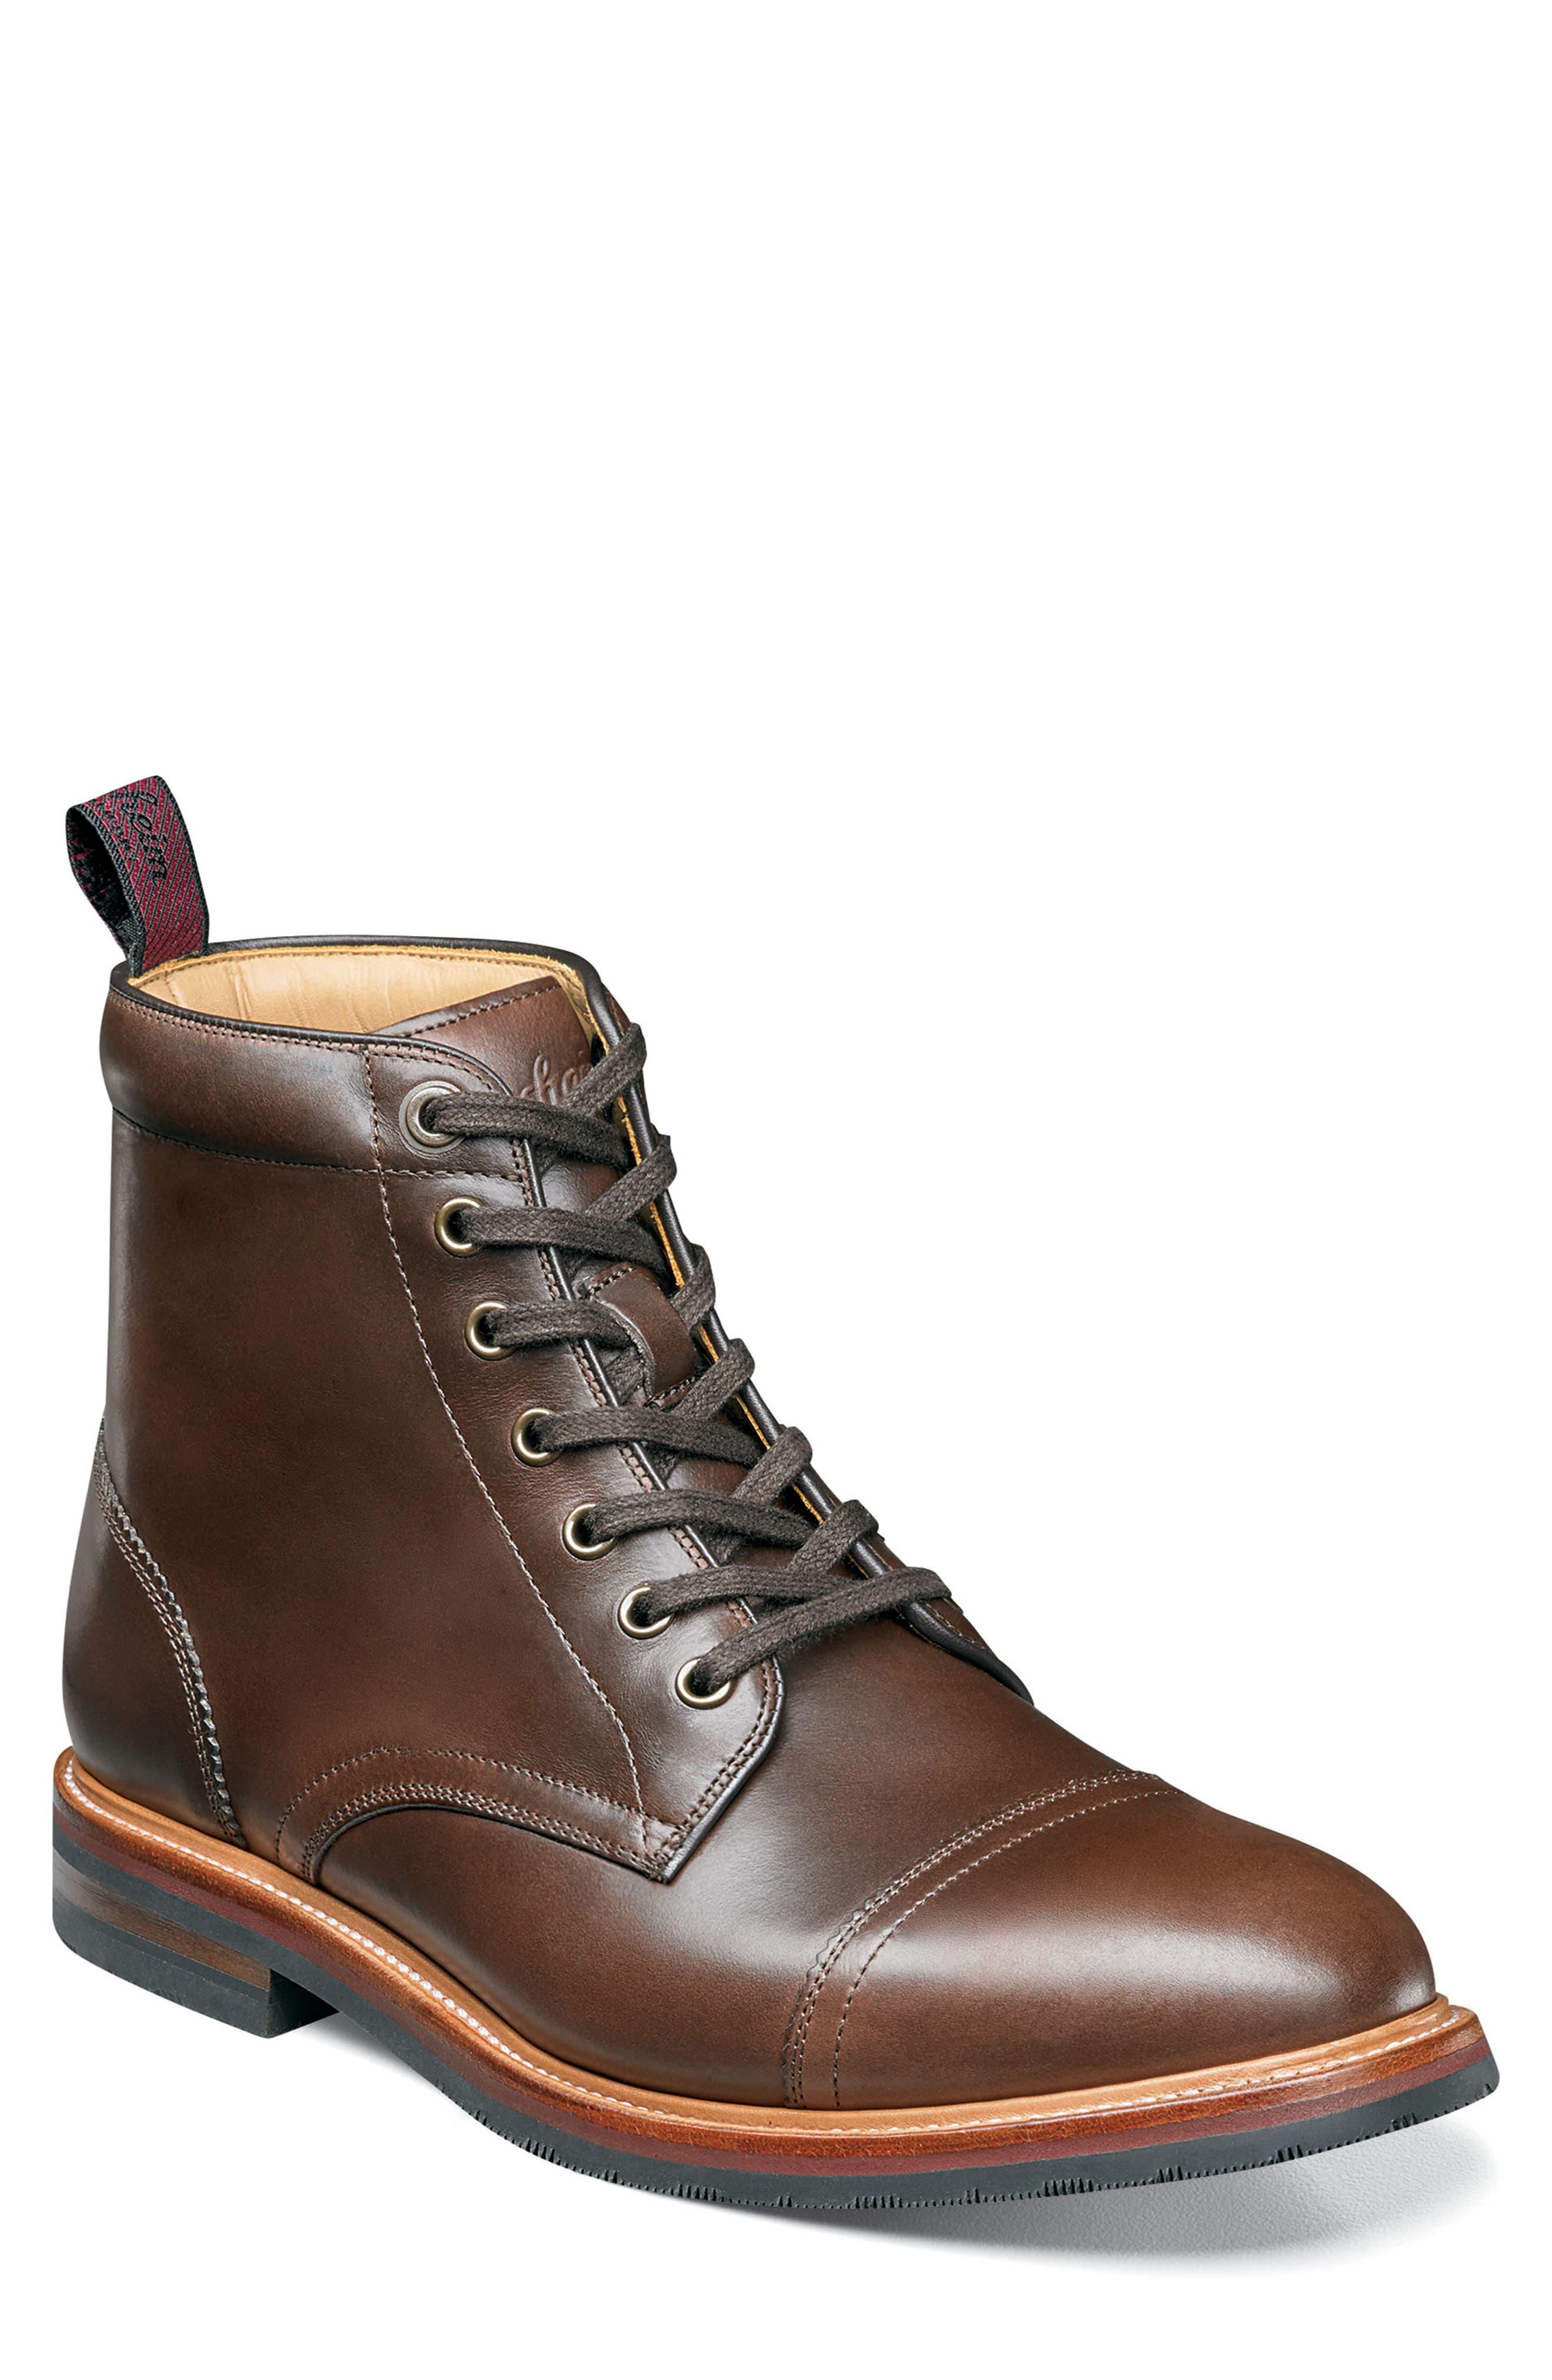 Florsheim Founcry Cap Toe Boot - Brown